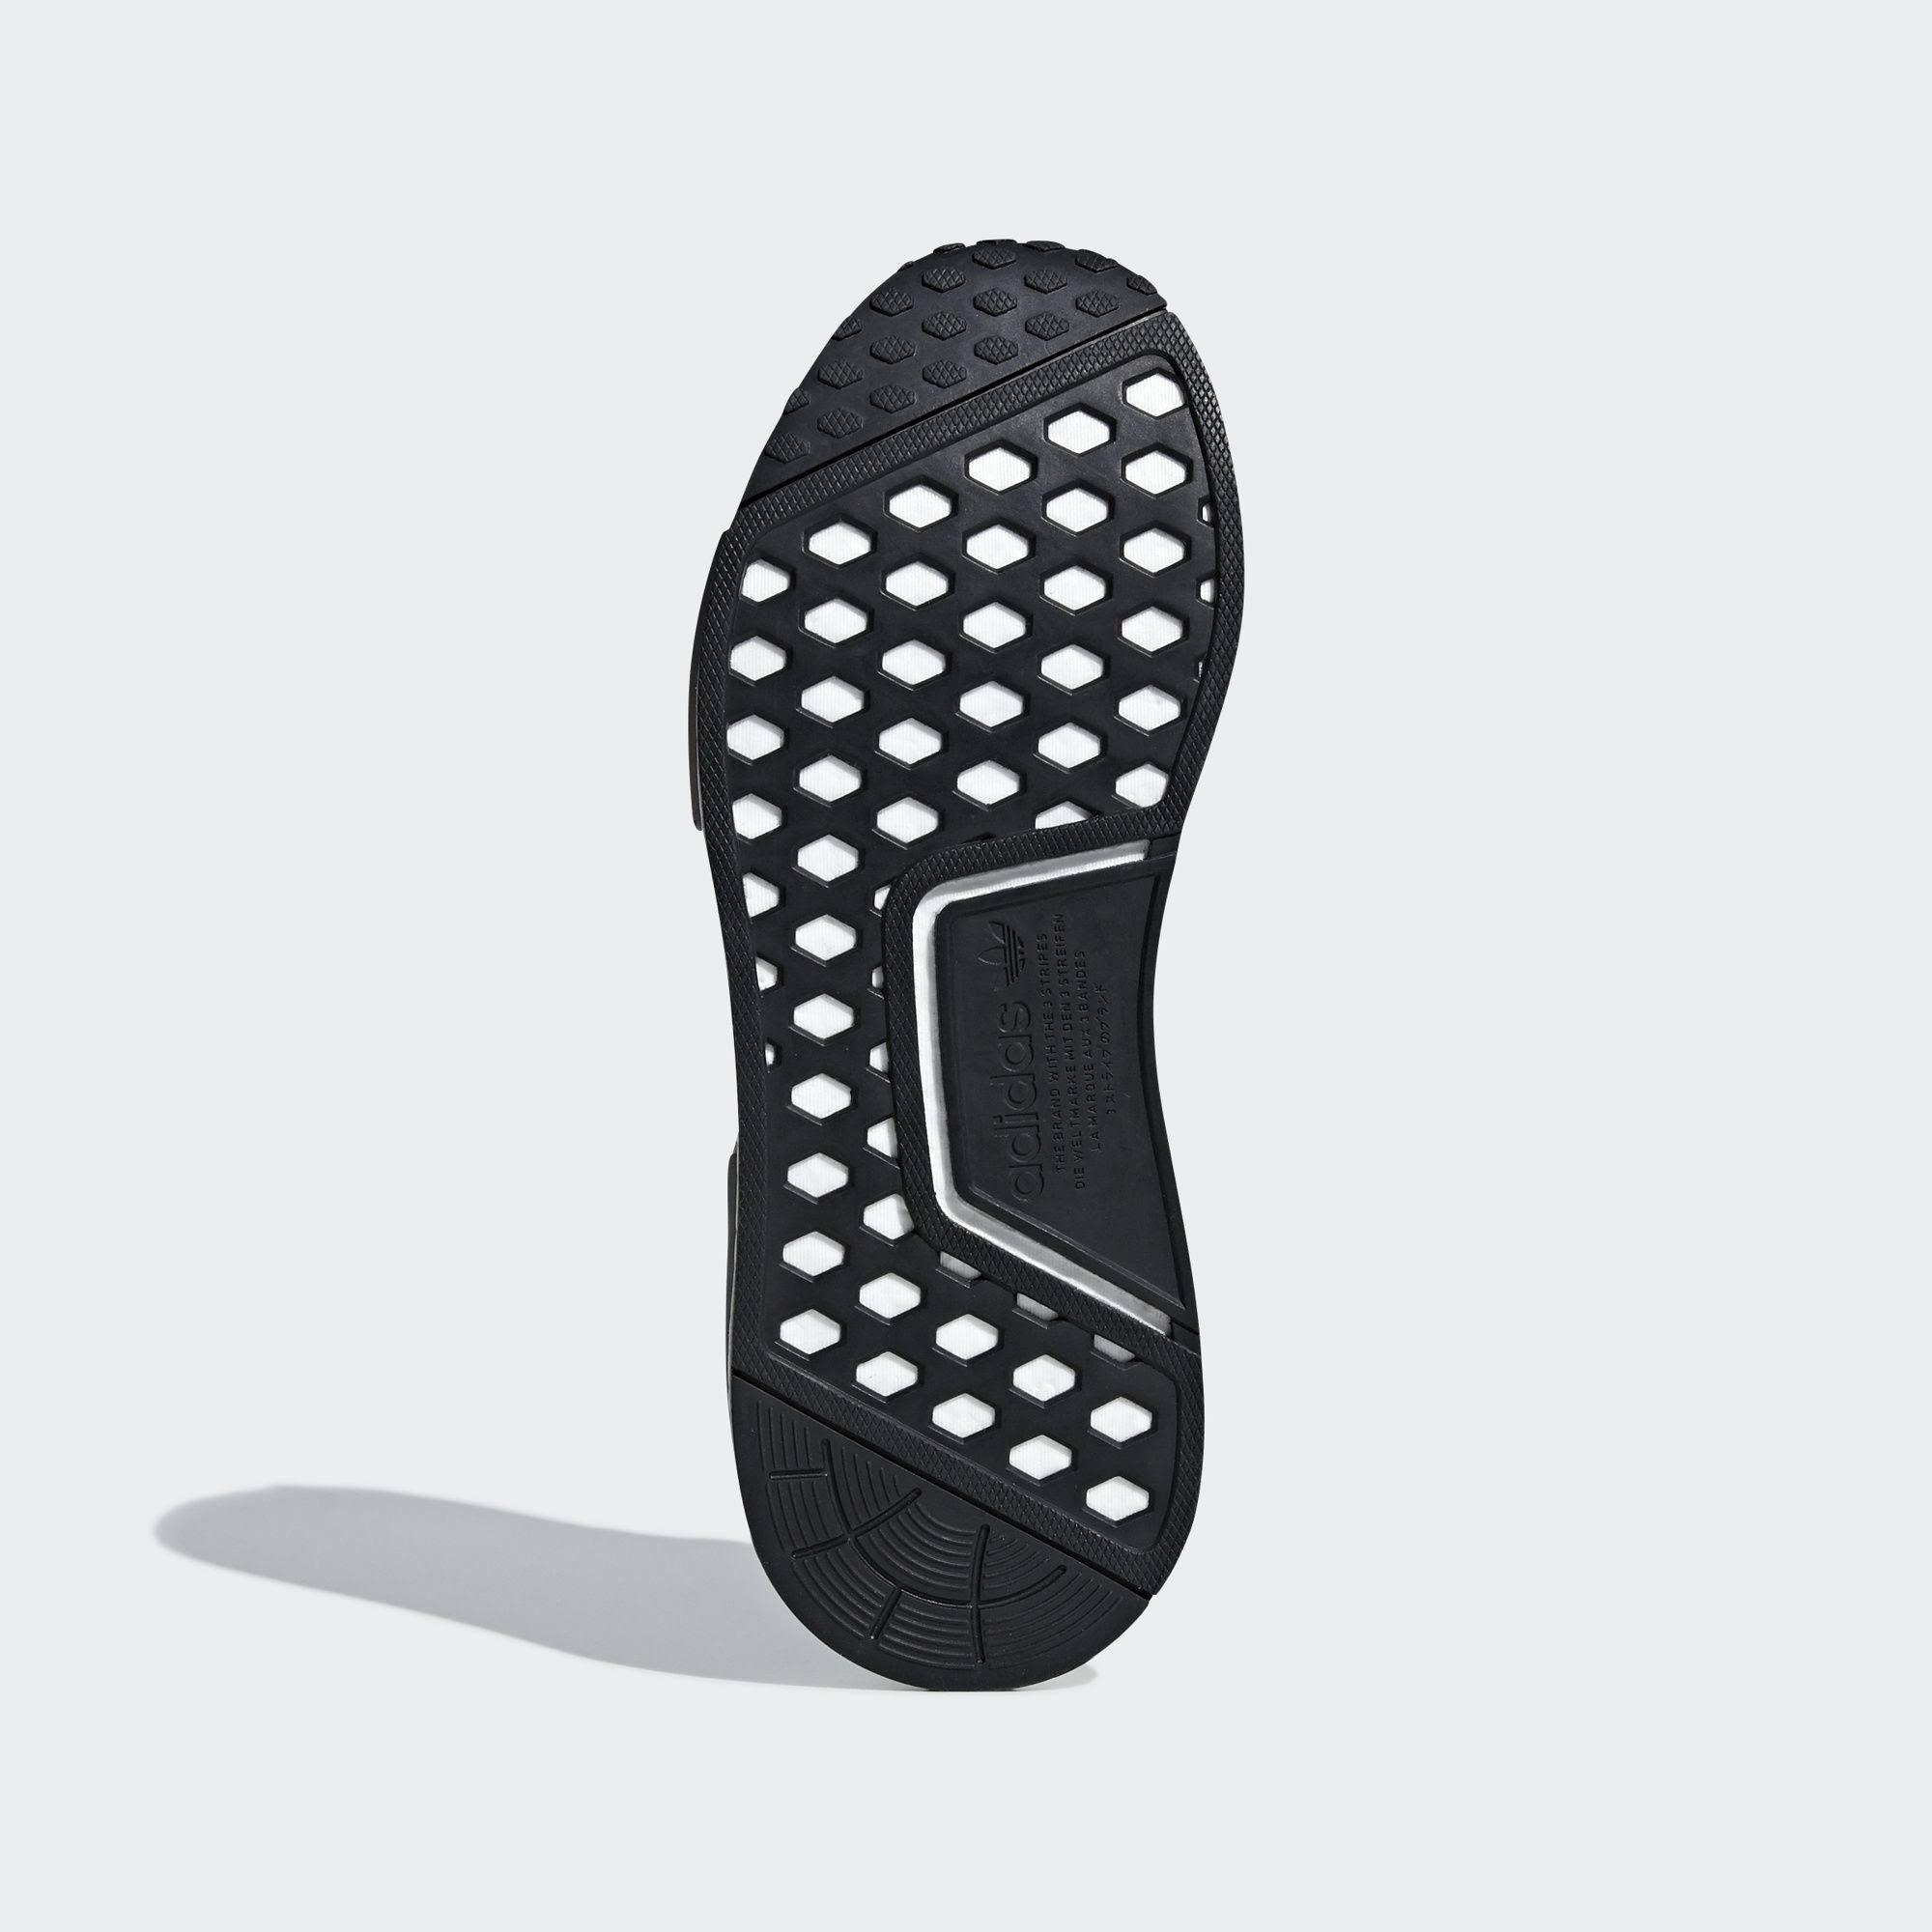 r1 0grigio Scarpe Nmd da uomo Originalsdimensioni10 Adidas EDb9eH2IWY